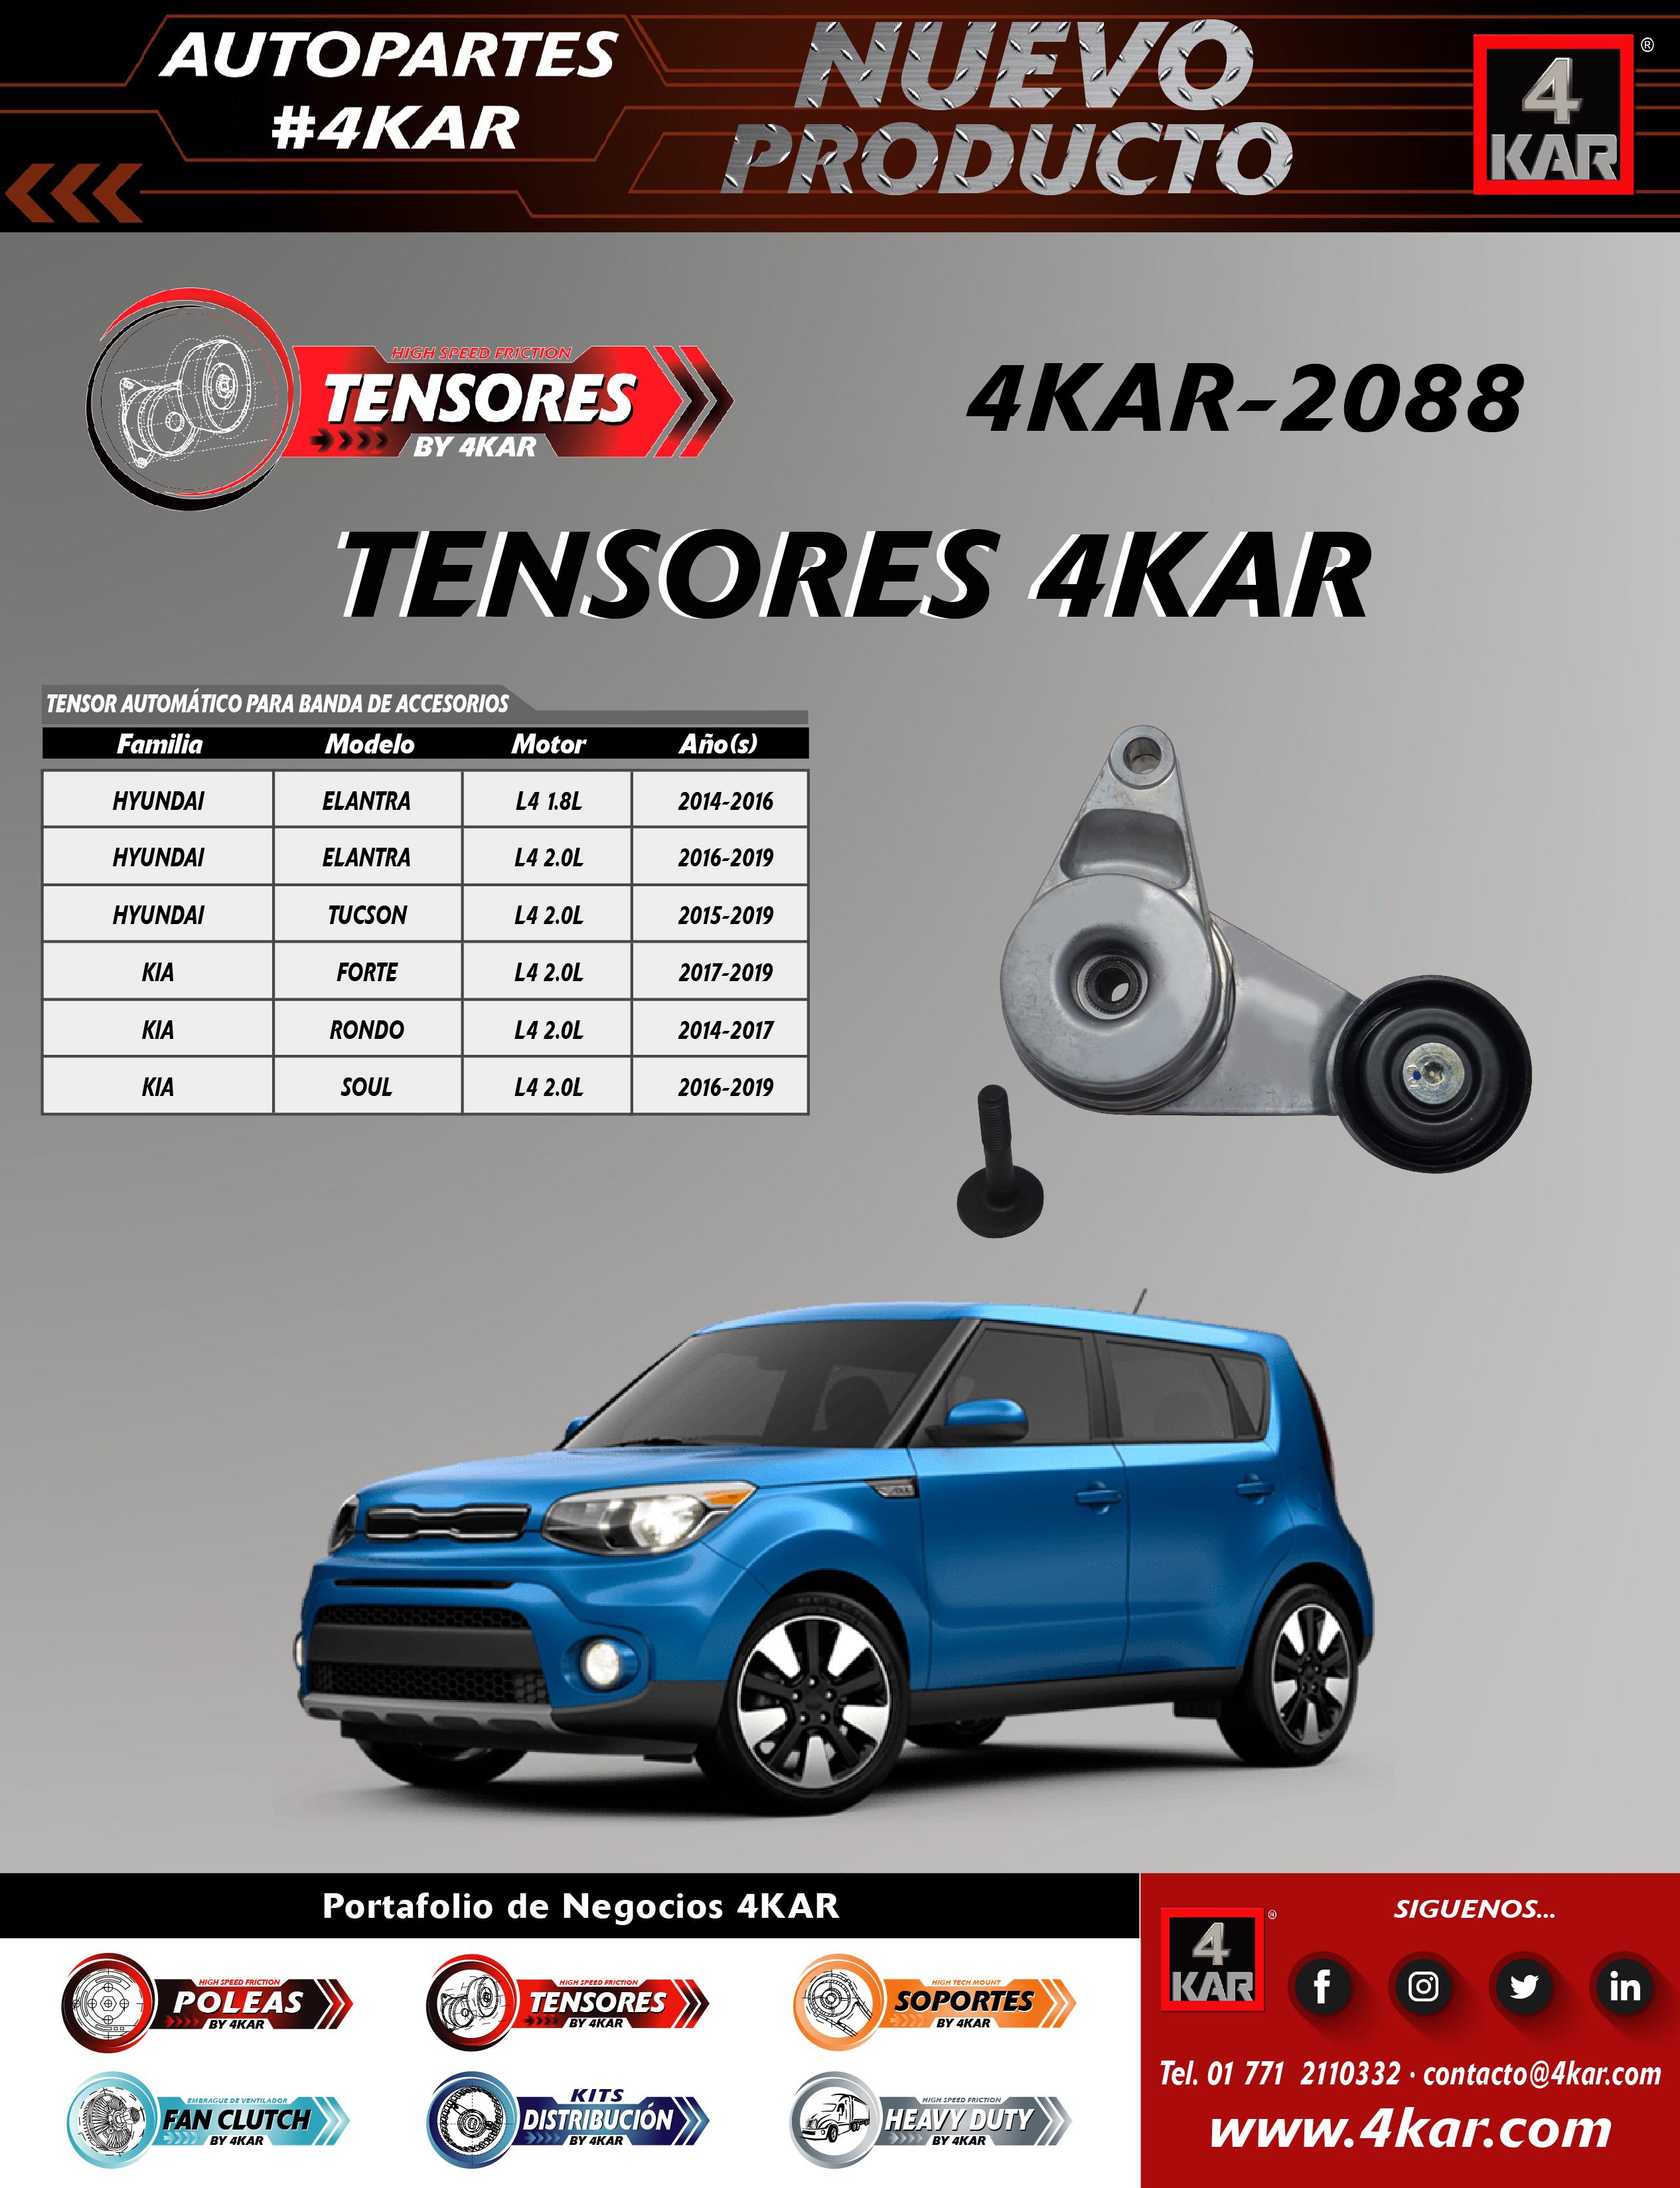 4KAR-2088 Tensor HYUNDAI ElantraL4 1.8L2014-2016 ElantraL4 2.0L2016-2019 TucsonL4 2.0L2015-2019 KIA Forte L4 2.0L2017-2019 RondoL4 2.0L2014-2017 SoulL4 2.0L2016-2019